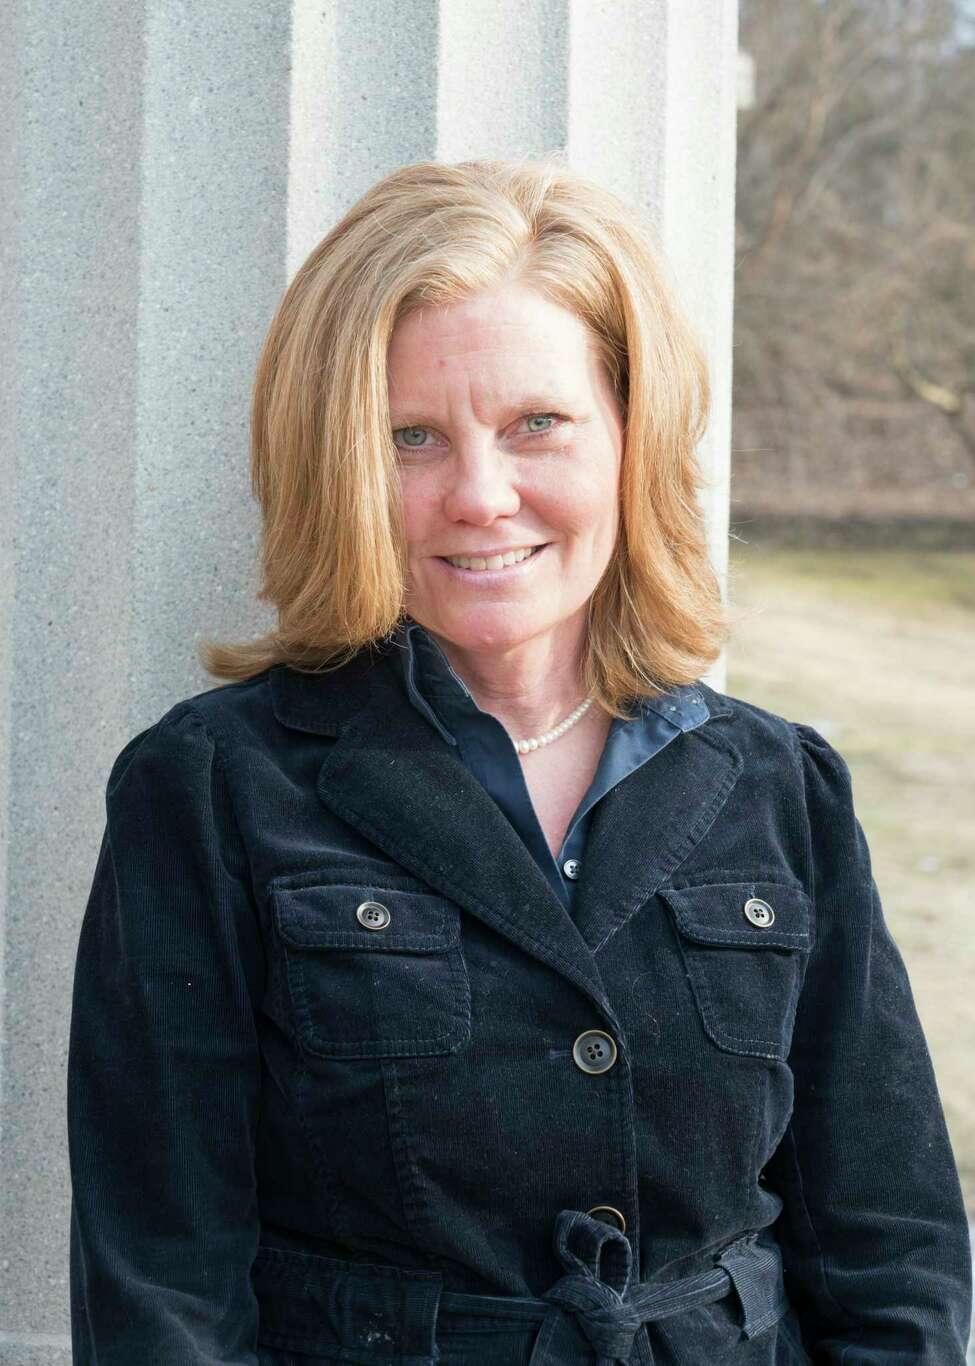 Patricia Morrison (Provided photo)